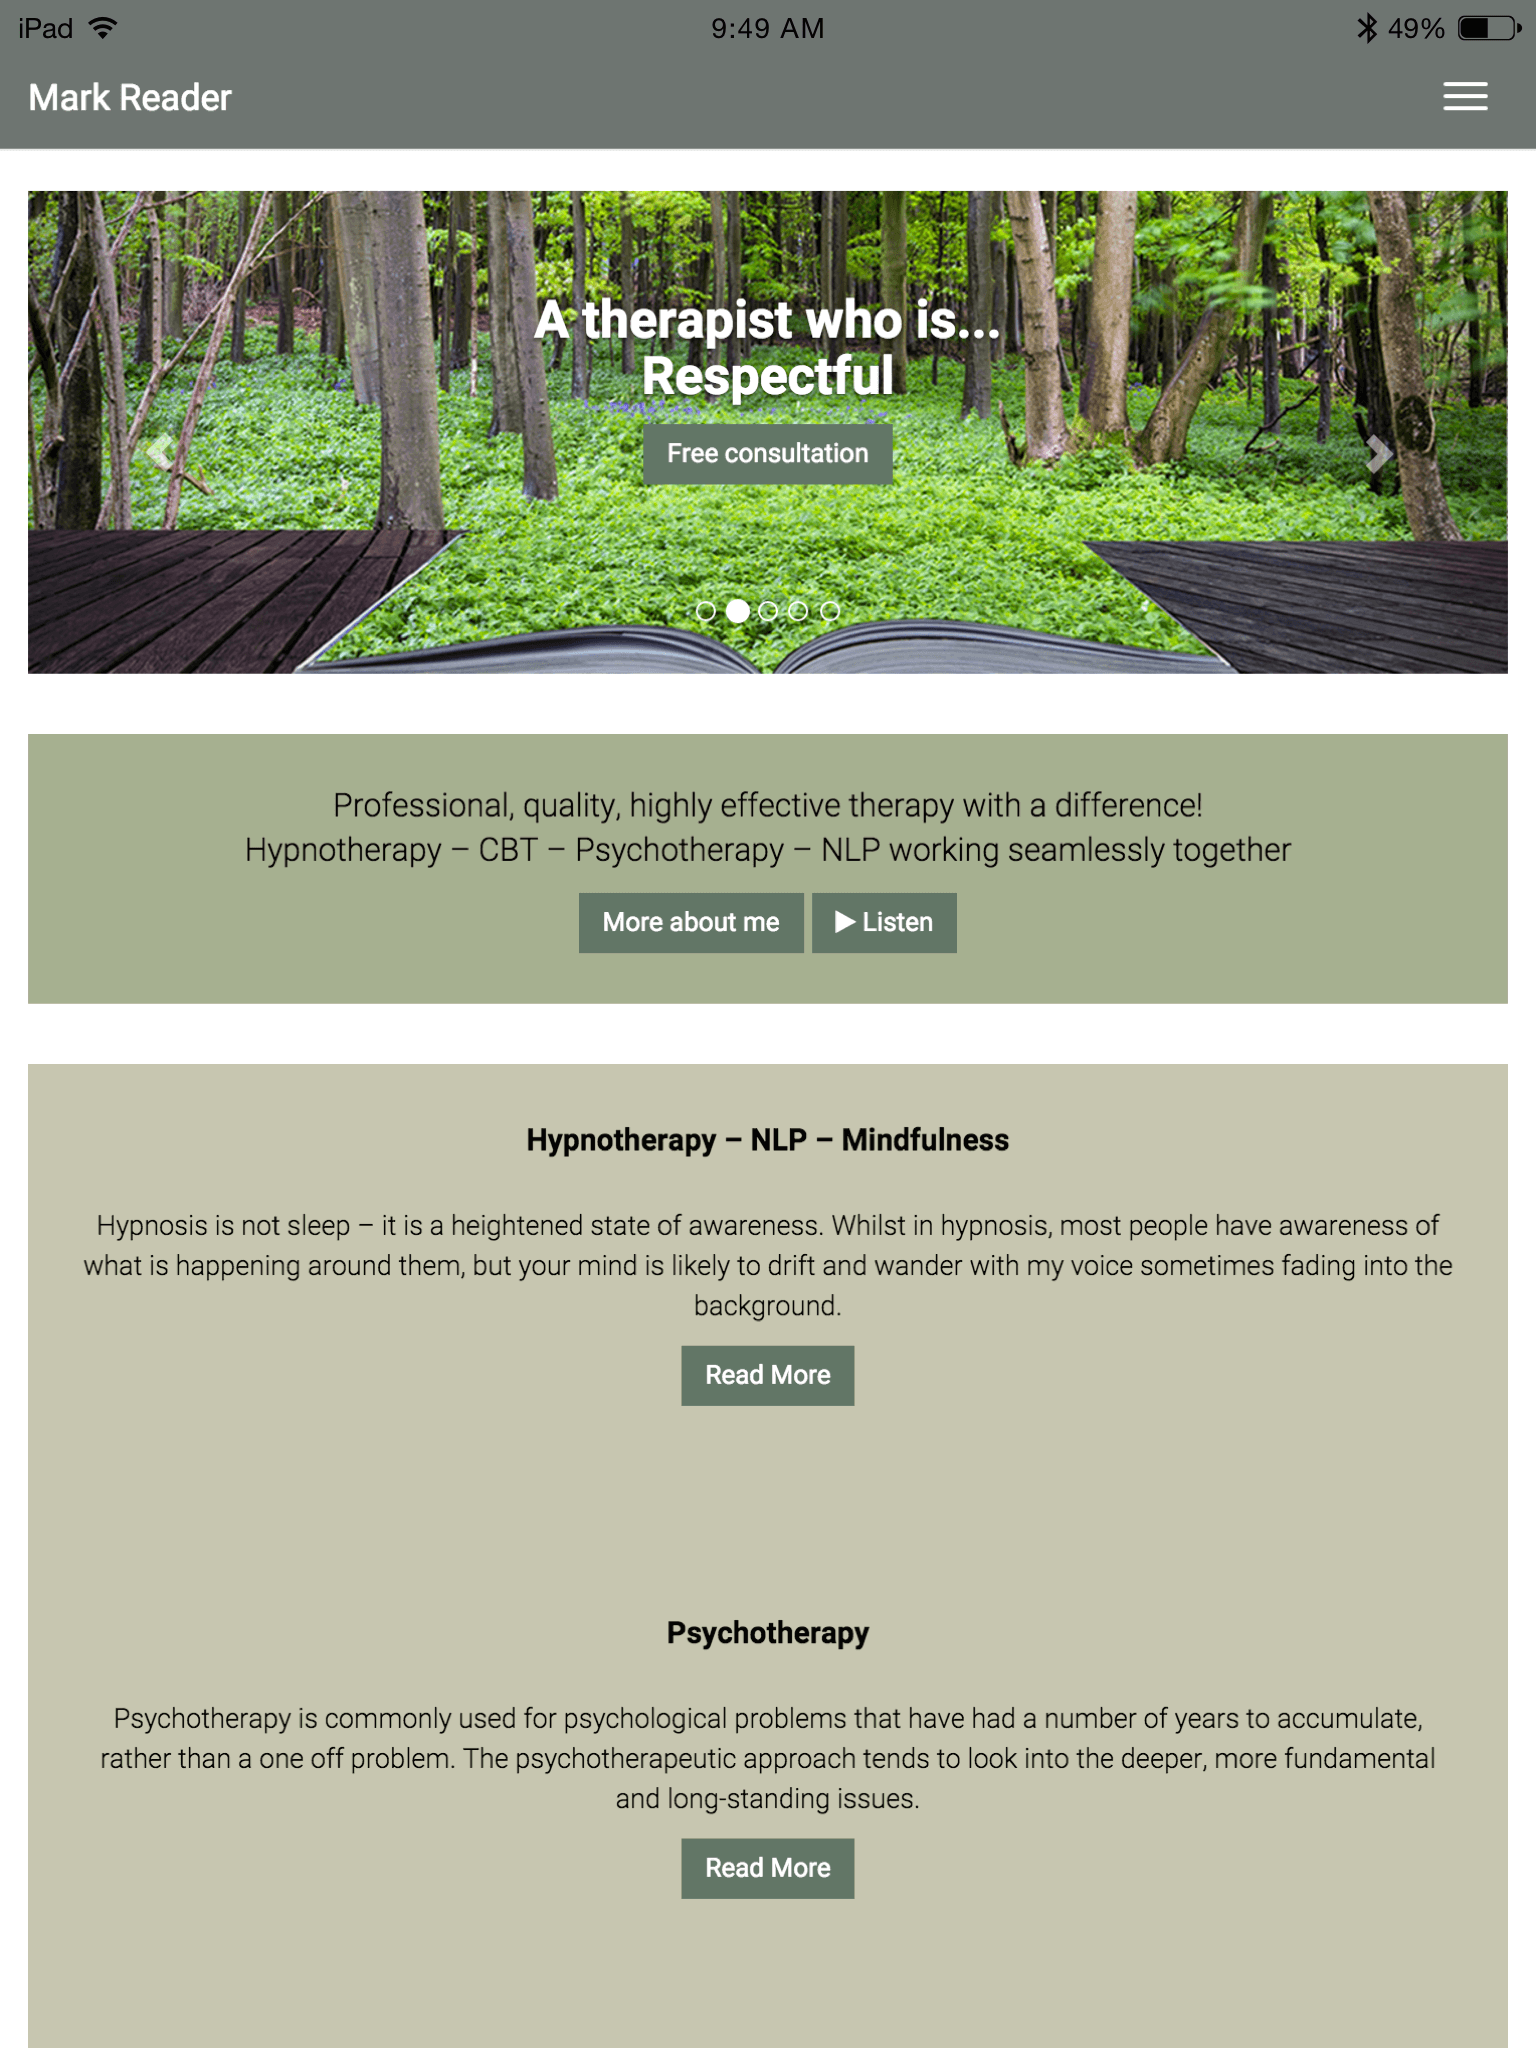 Mark Reader Integrative Therapist website (Website on tablet)